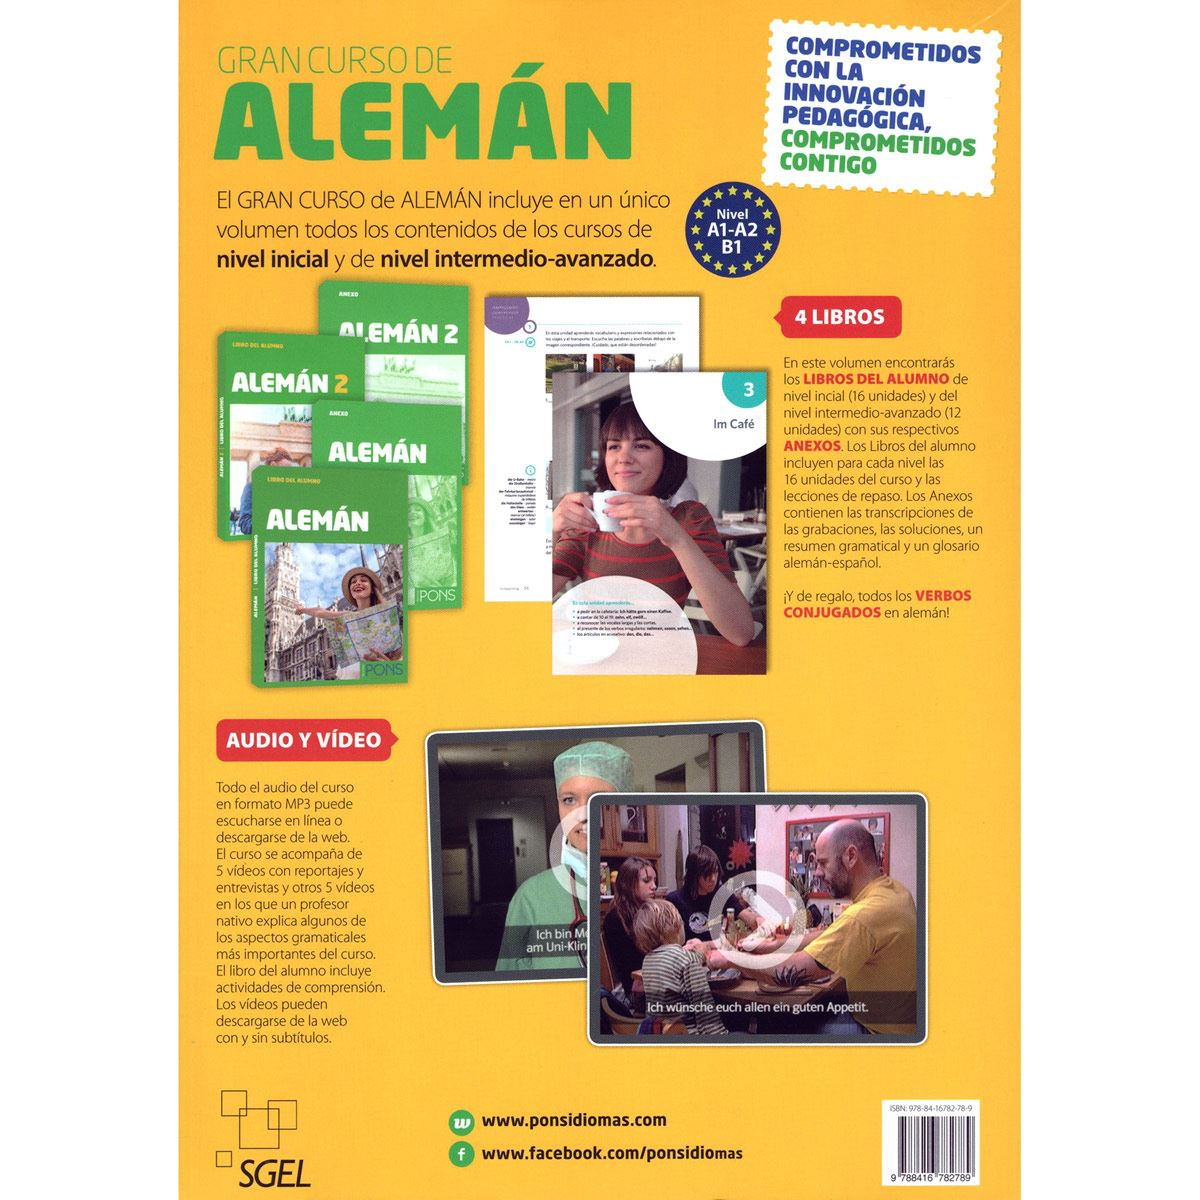 Gran curso de Alemán 4 Libros